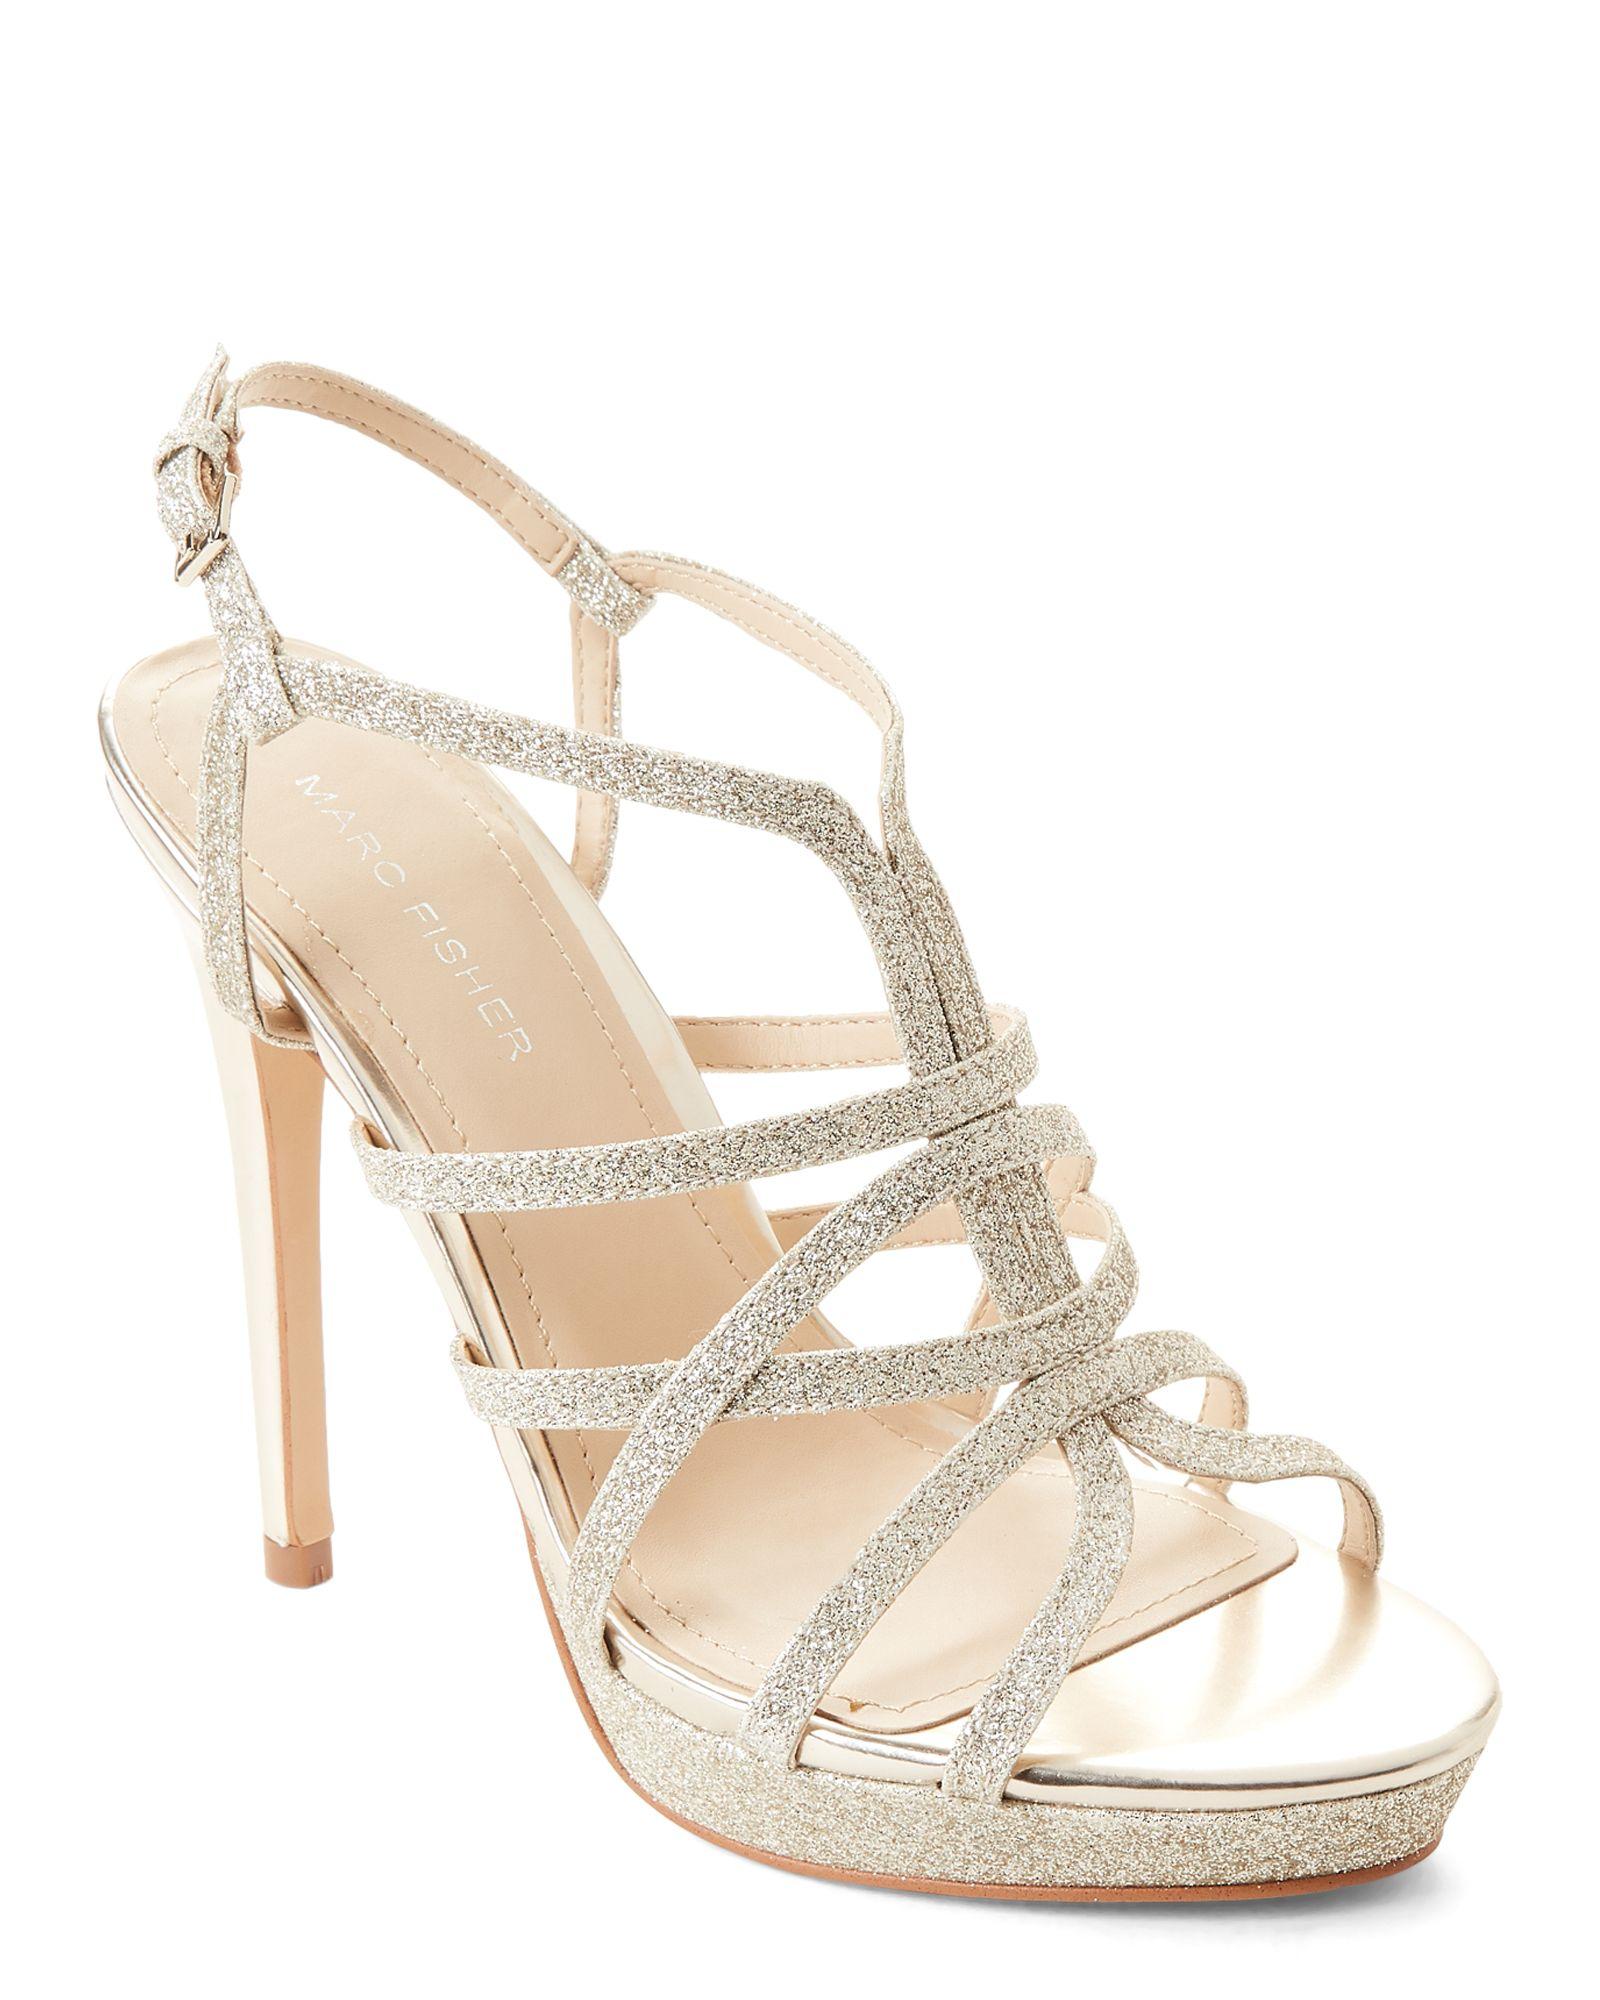 5c15390628 Gold Jaslyn Glitter Strappy Platform Sandals | *Apparel ...